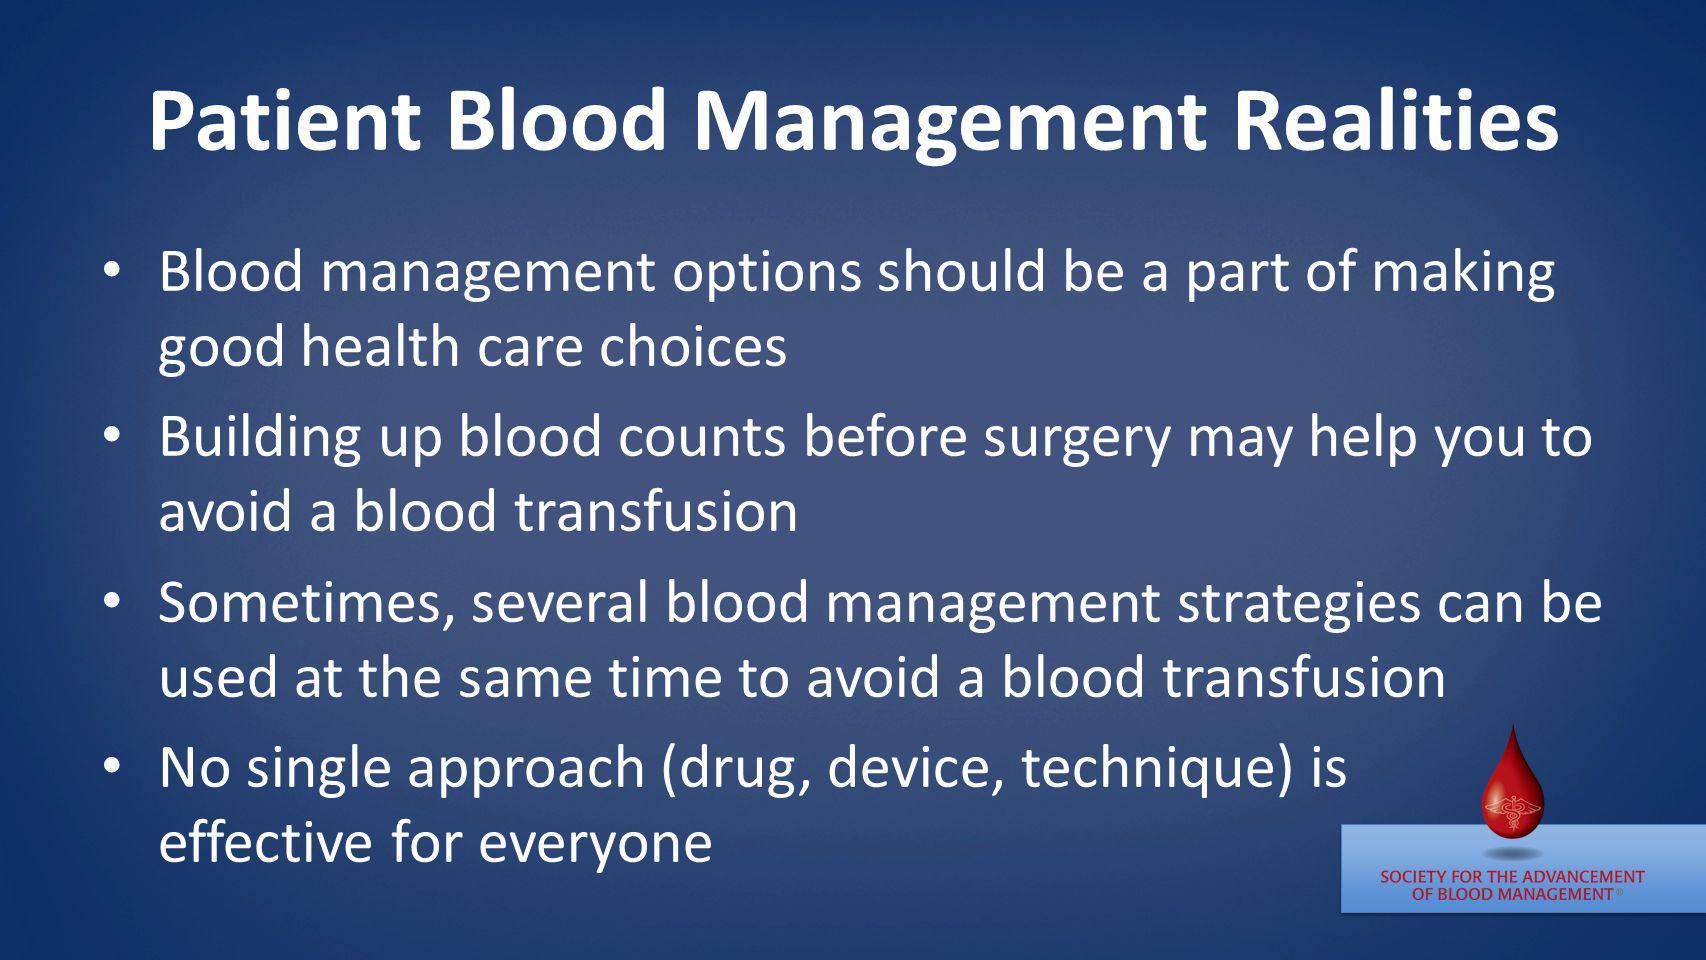 Patient Blood Management Realities